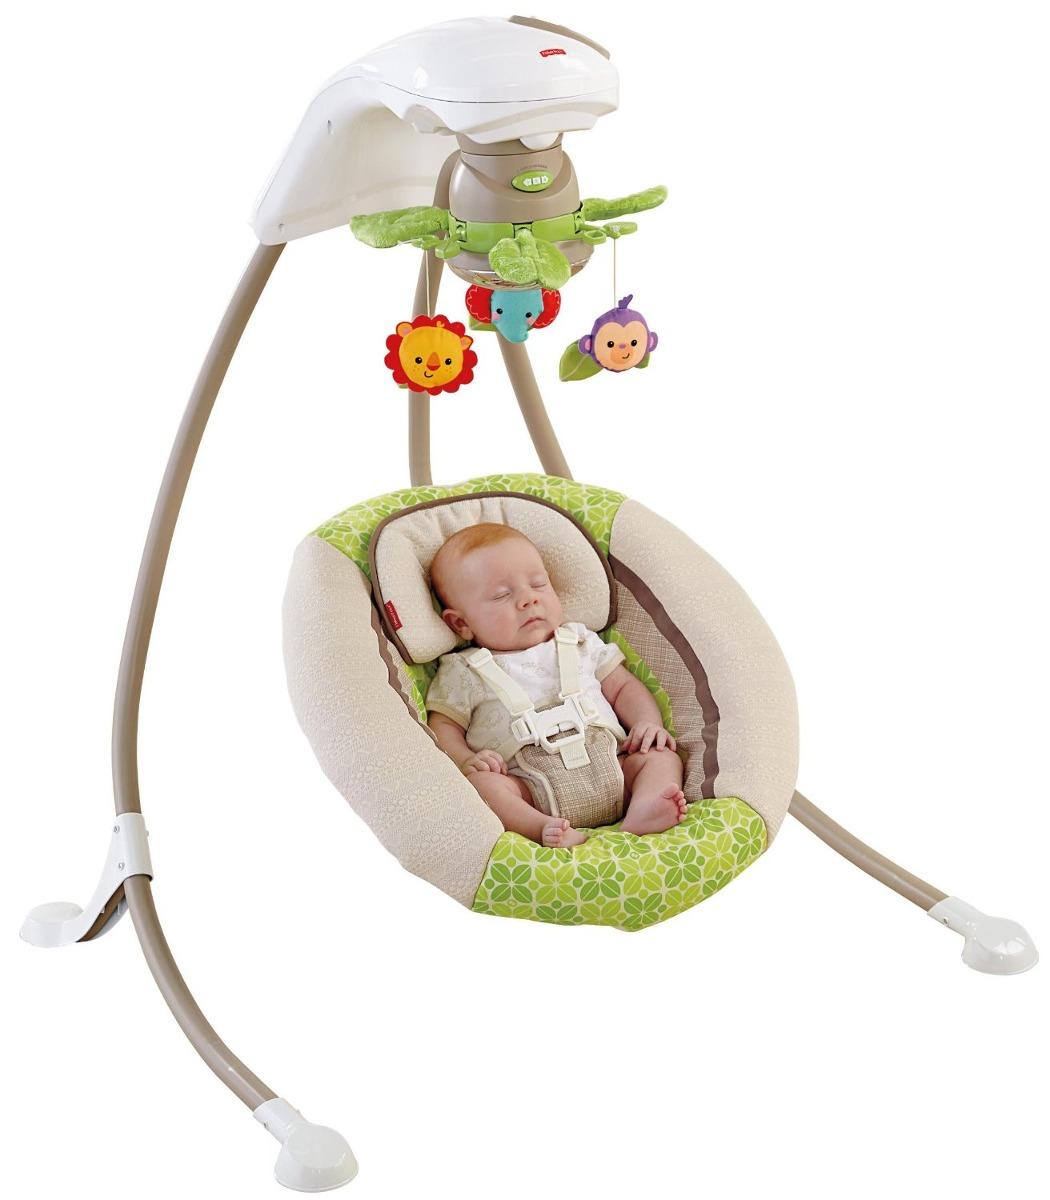 cadeira balanço fisher price deluxe cradle 'n swing #9D942E 1050x1200